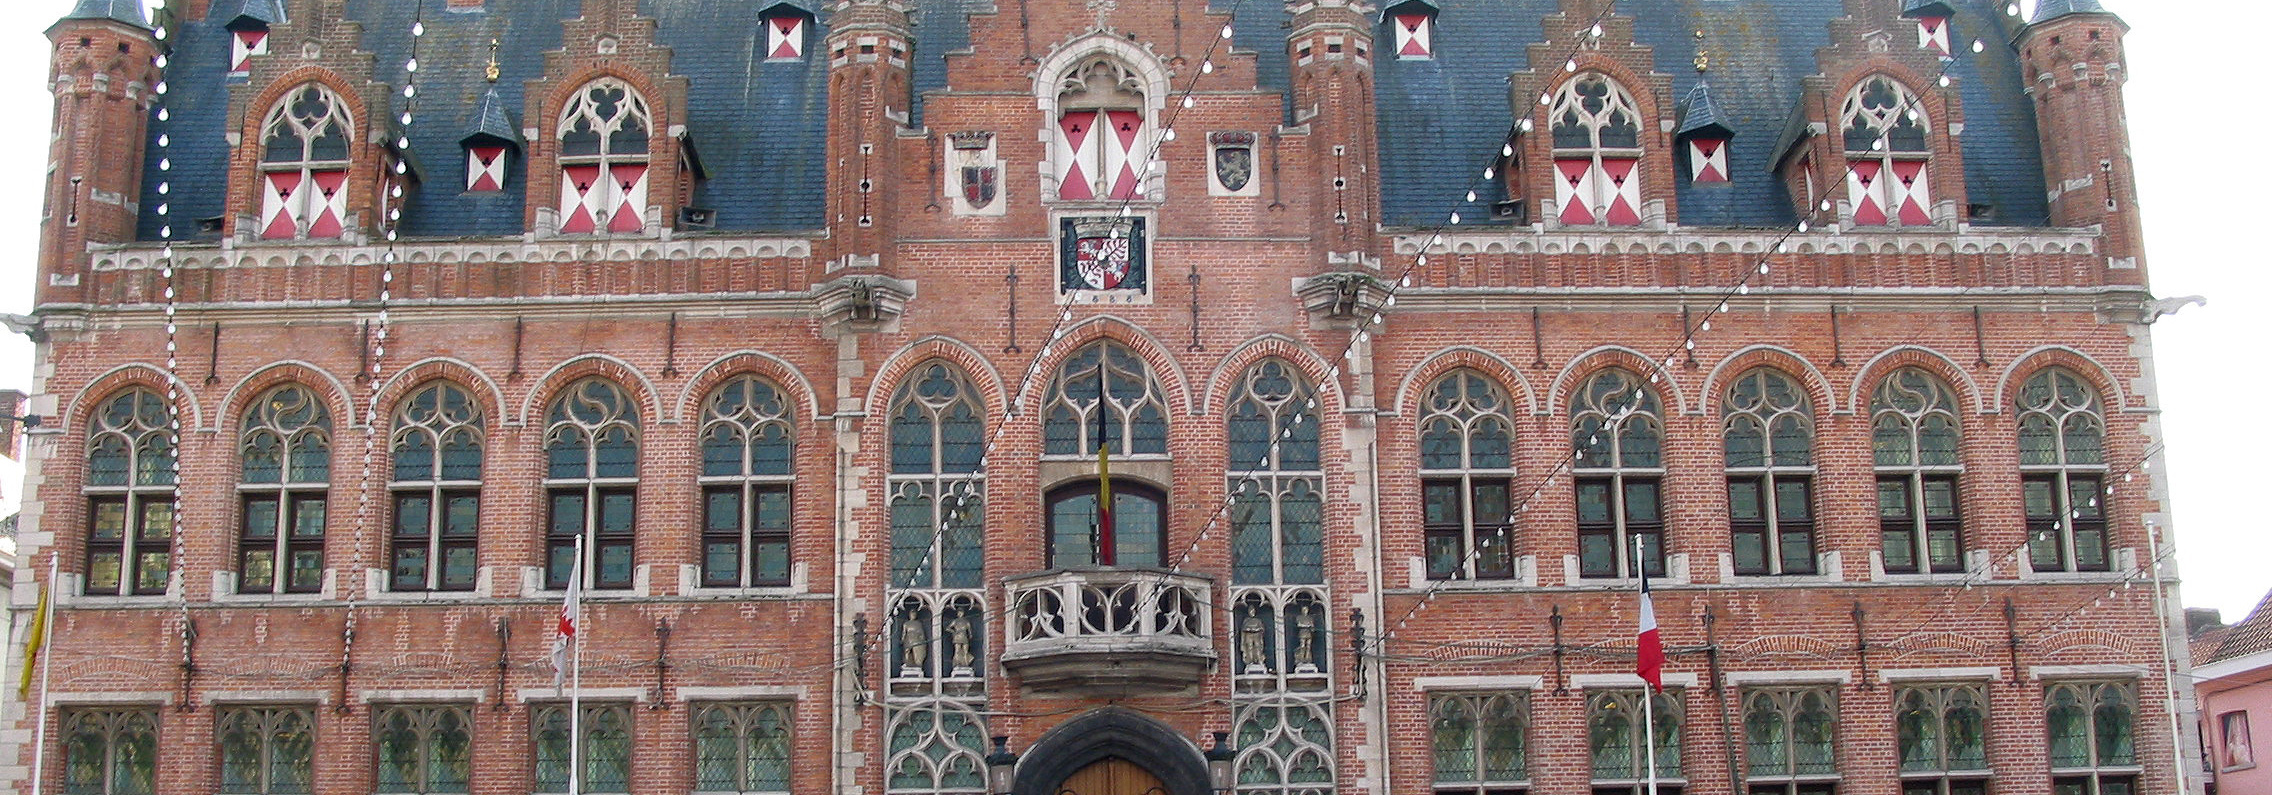 Rathaus in Mouscron, Quelle Wikimedia: https://de.wikipedia.org/wiki/Mouscron